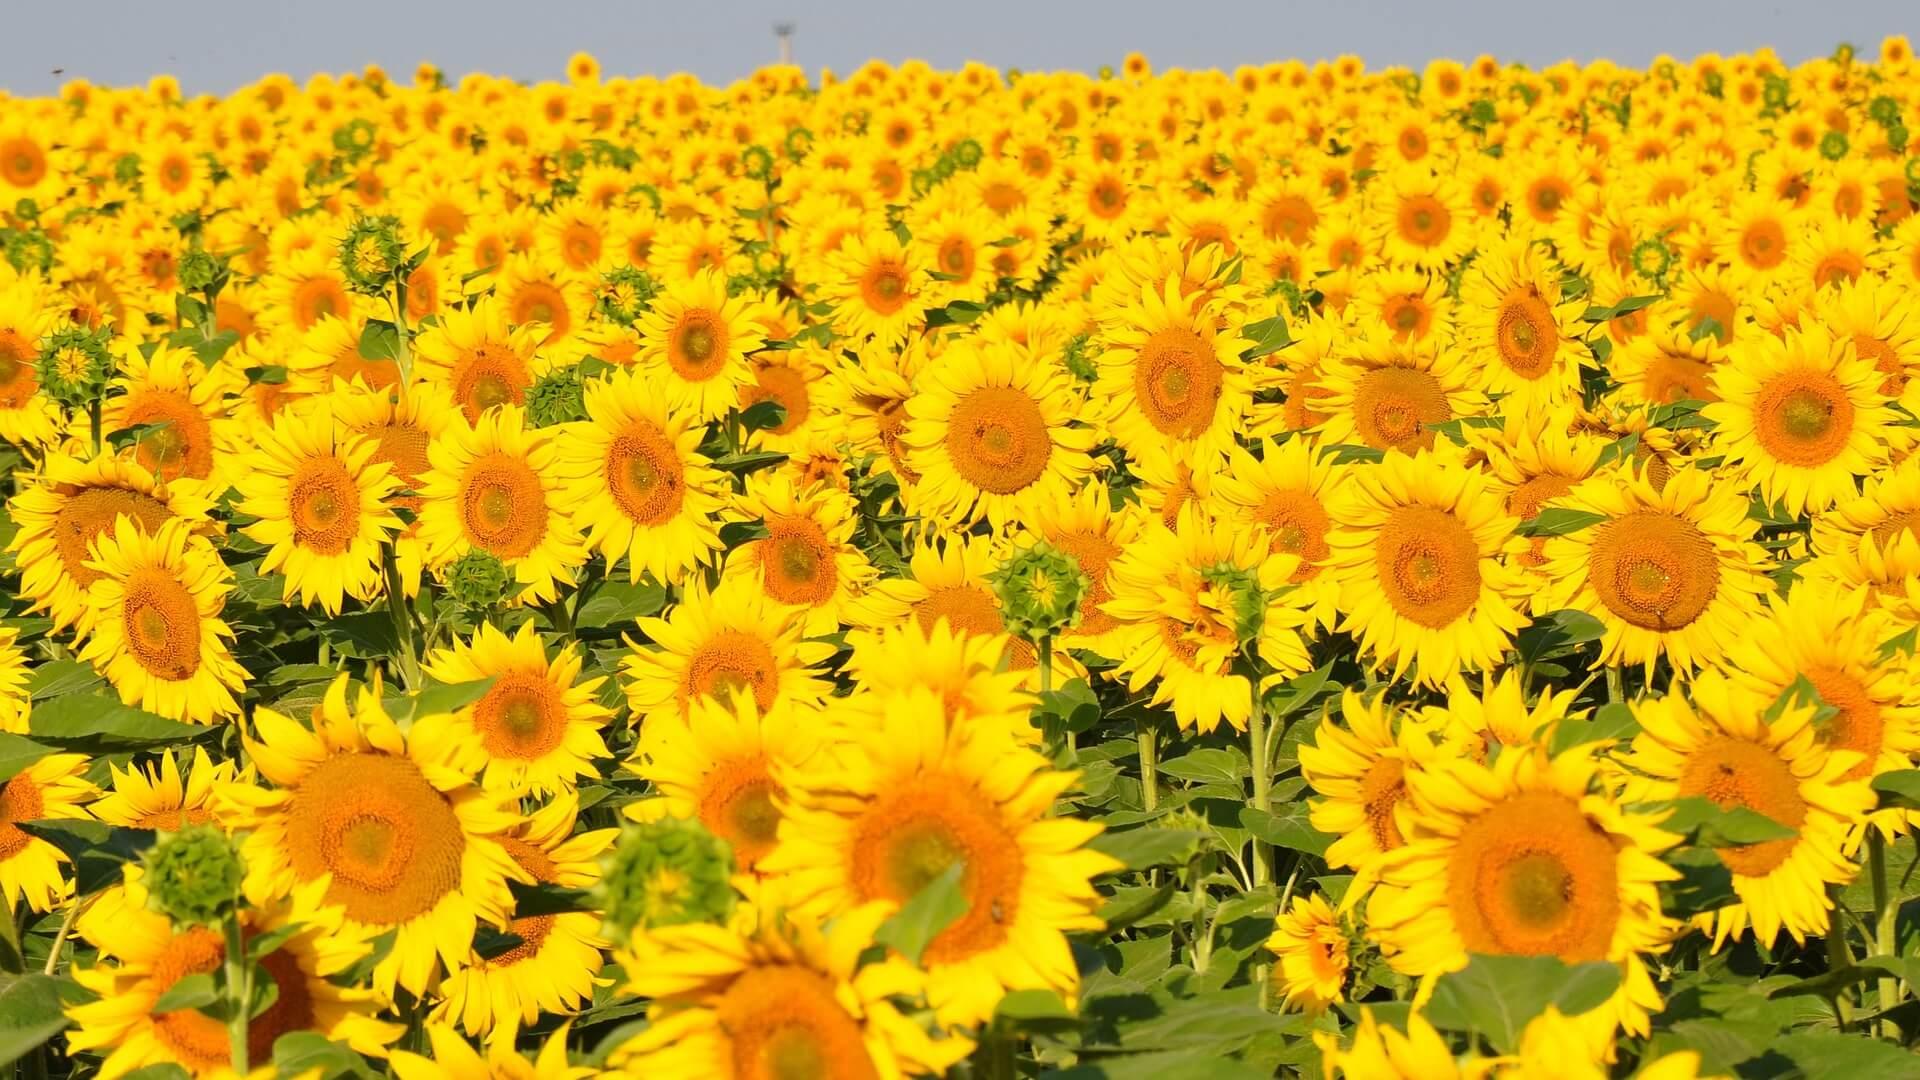 sunflower-843419_1920